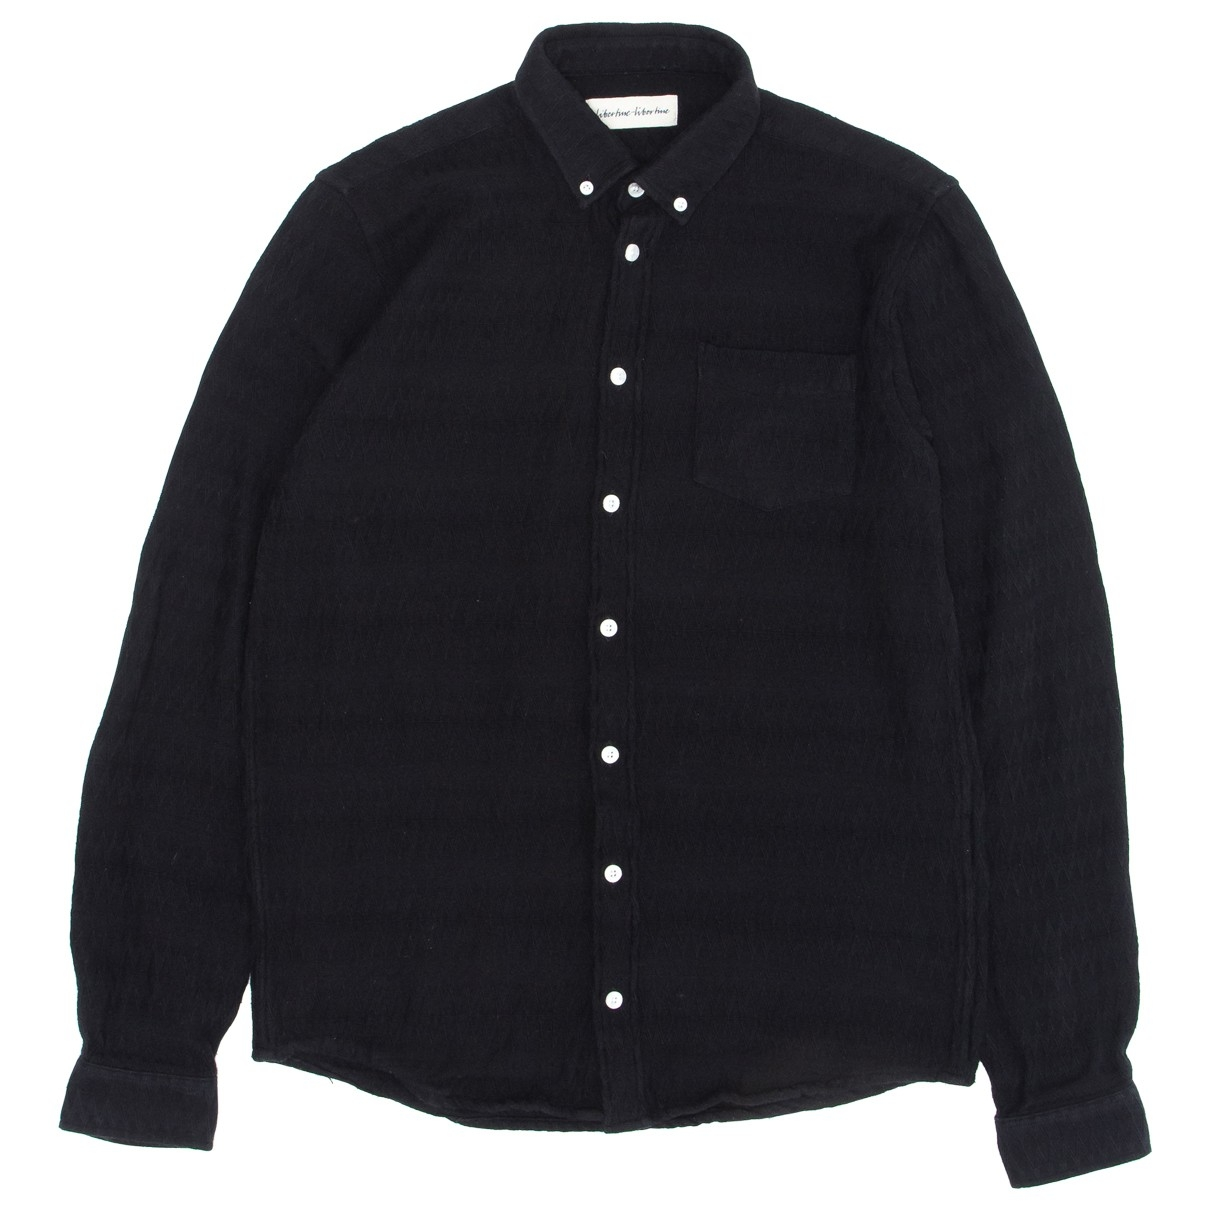 Libertine Libertine \N Black Cotton Shirts for Men S International